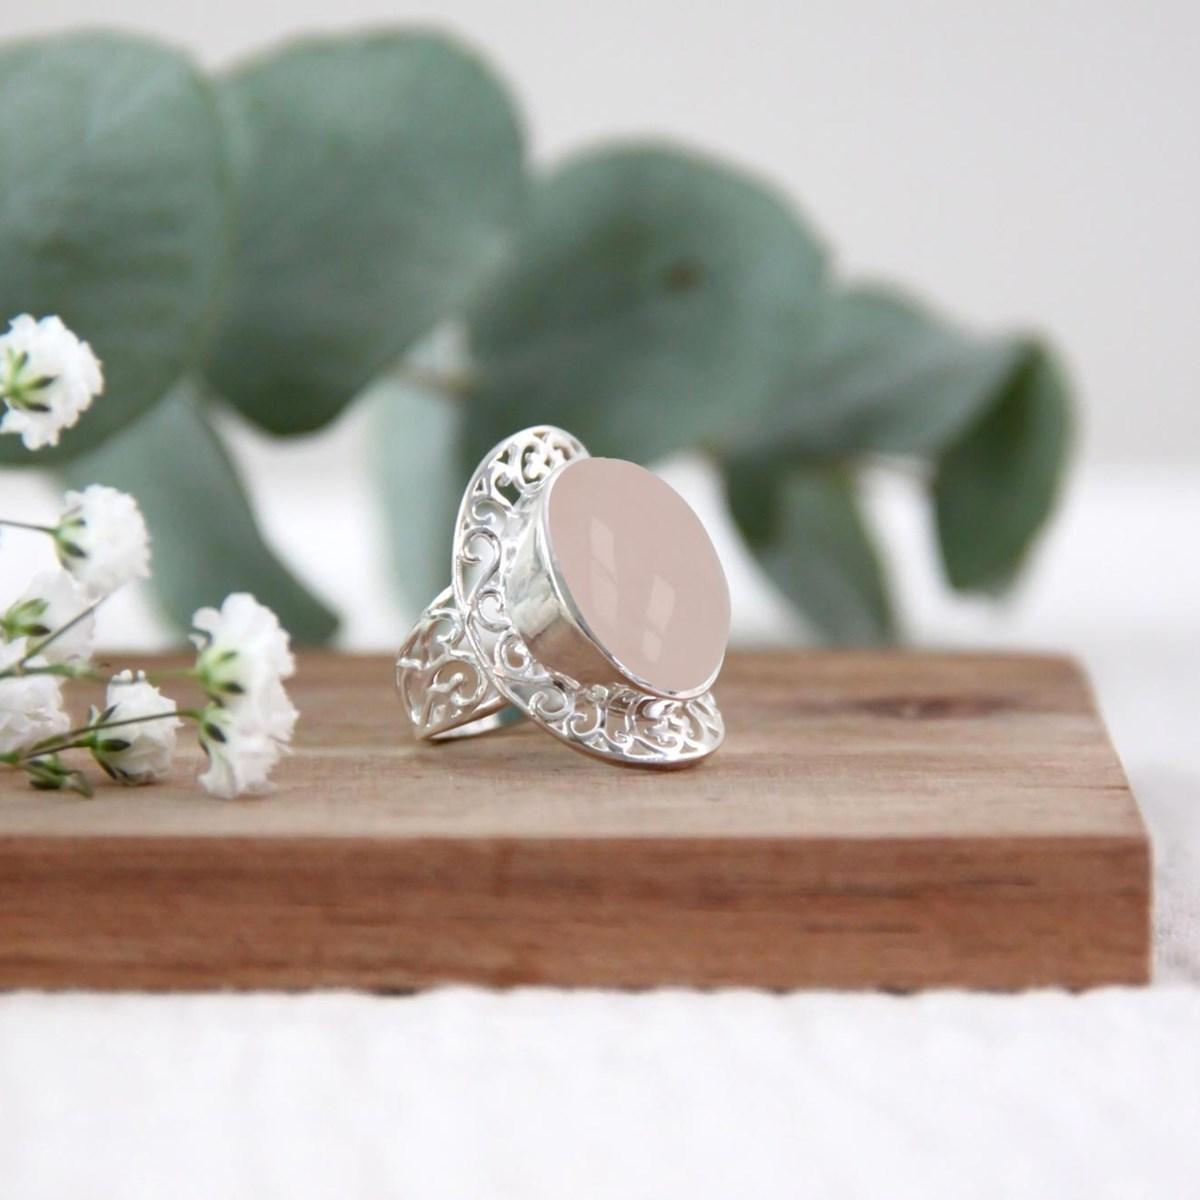 49# Bague artisanale en argent sterling 925 avec quartz rose naturel